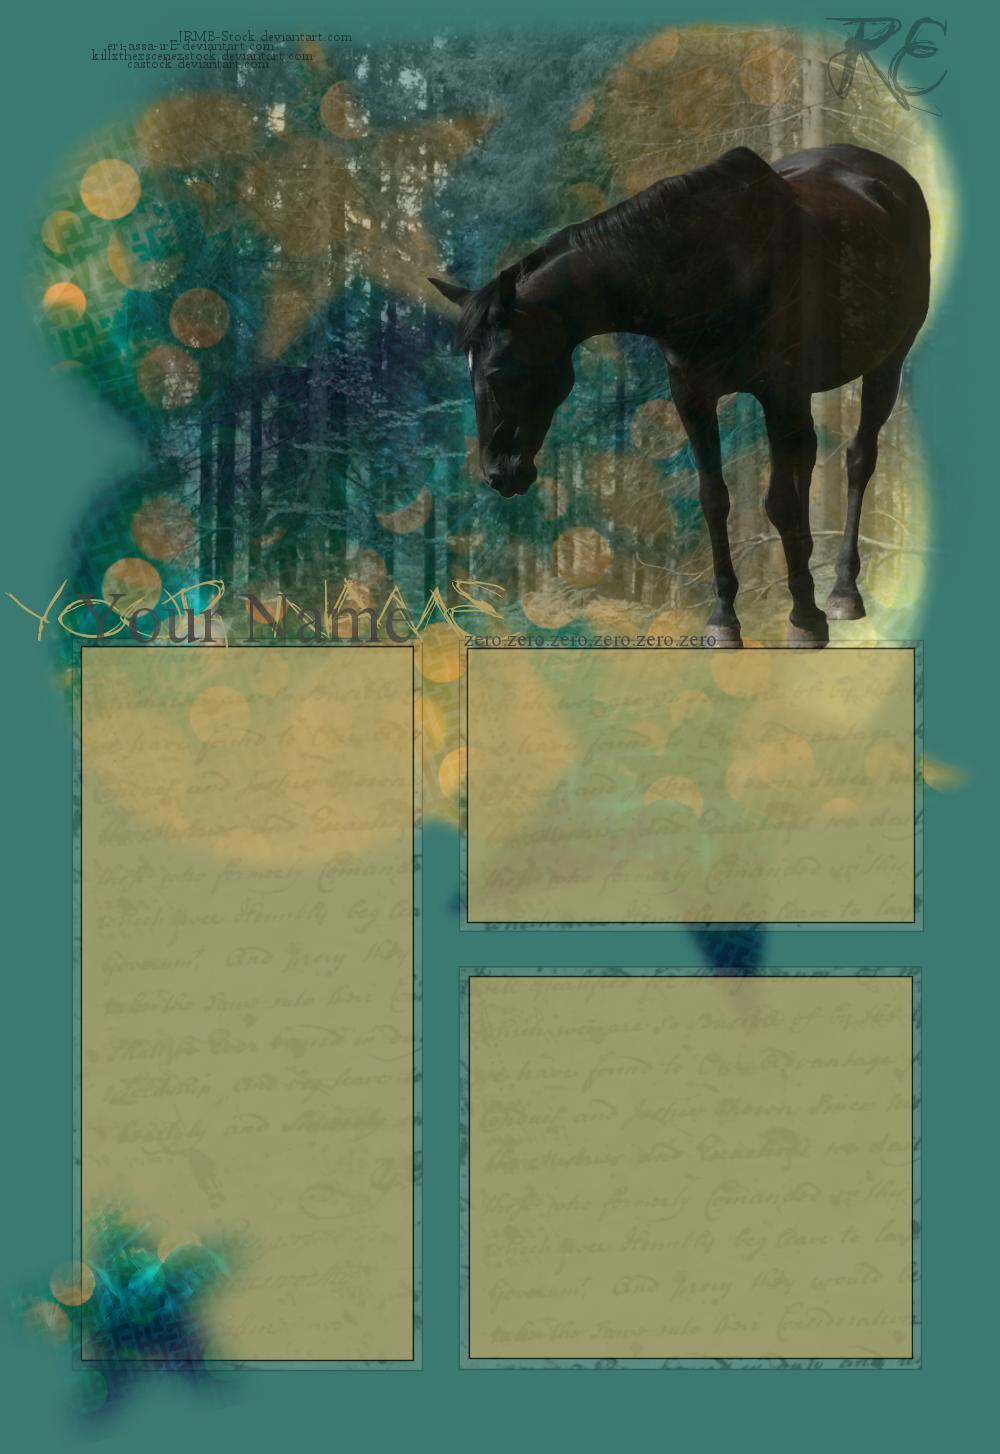 Black Horse by friesian21